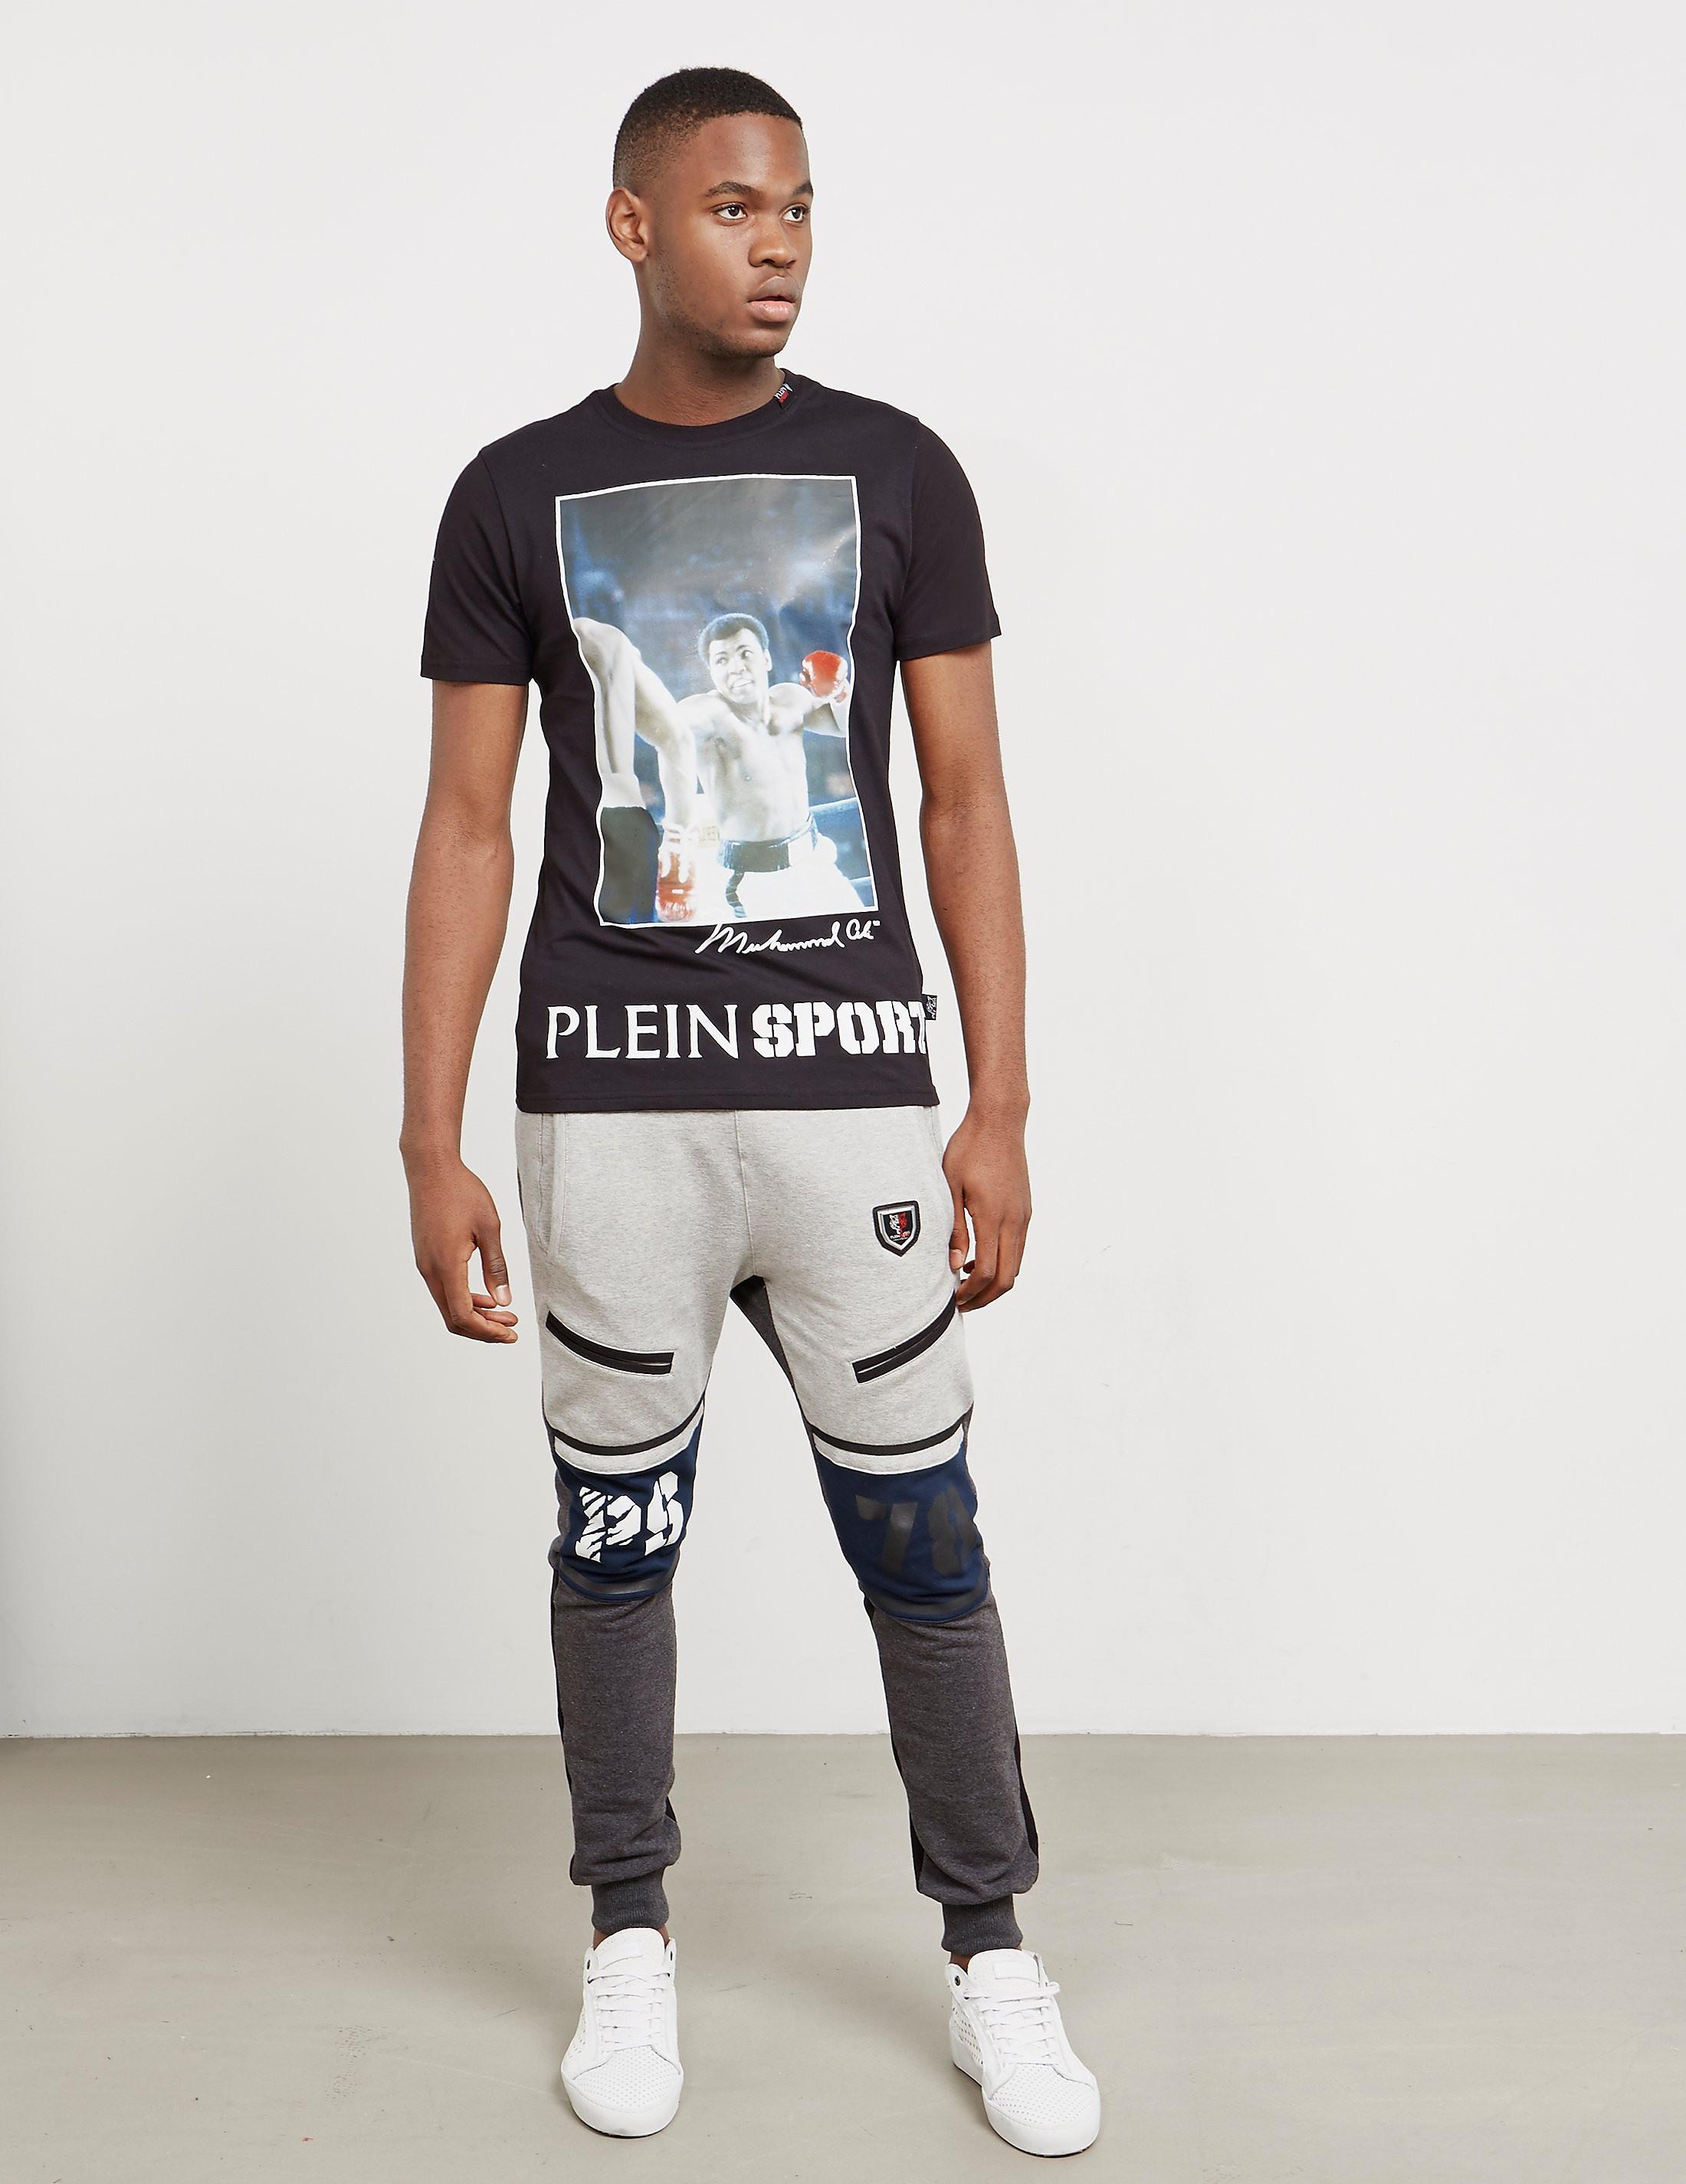 Philipp Plein Sport Ali Punch Short Sleeve T-Shirt